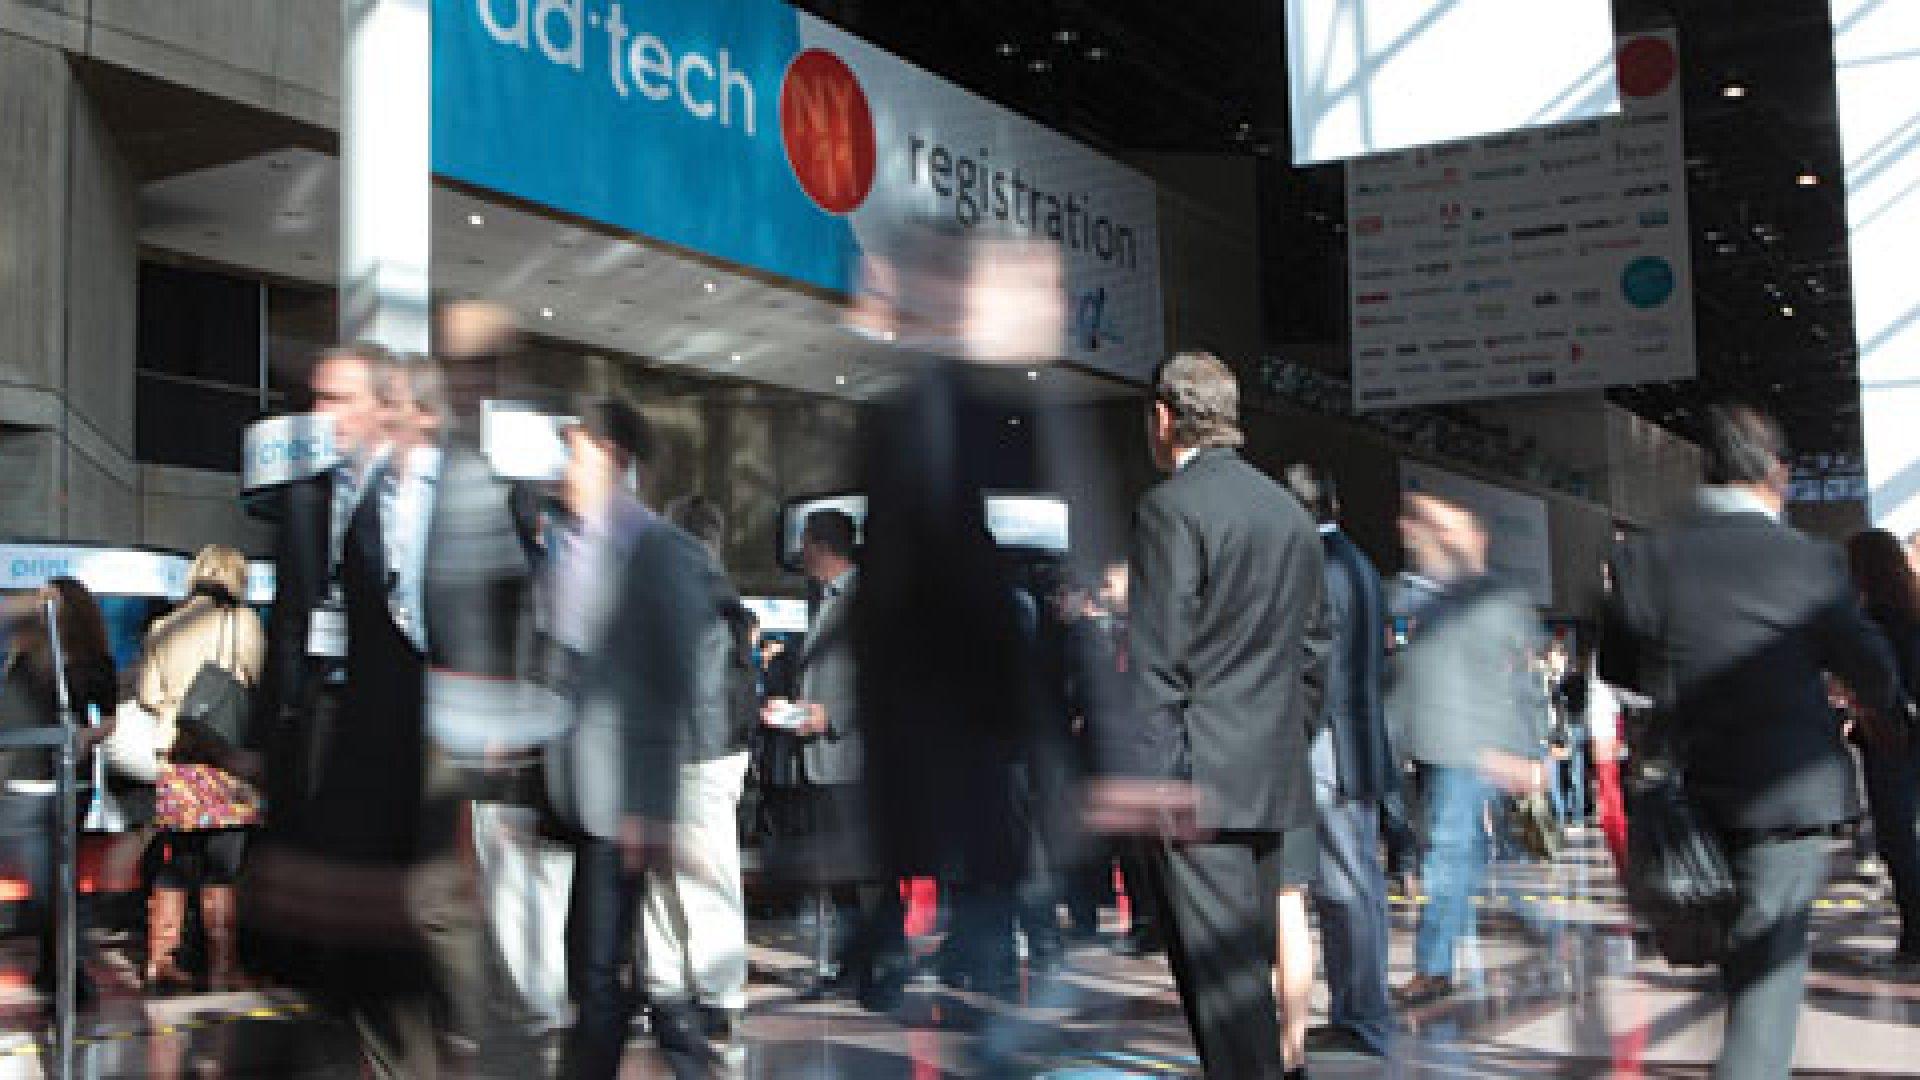 ad:tech New York 2011